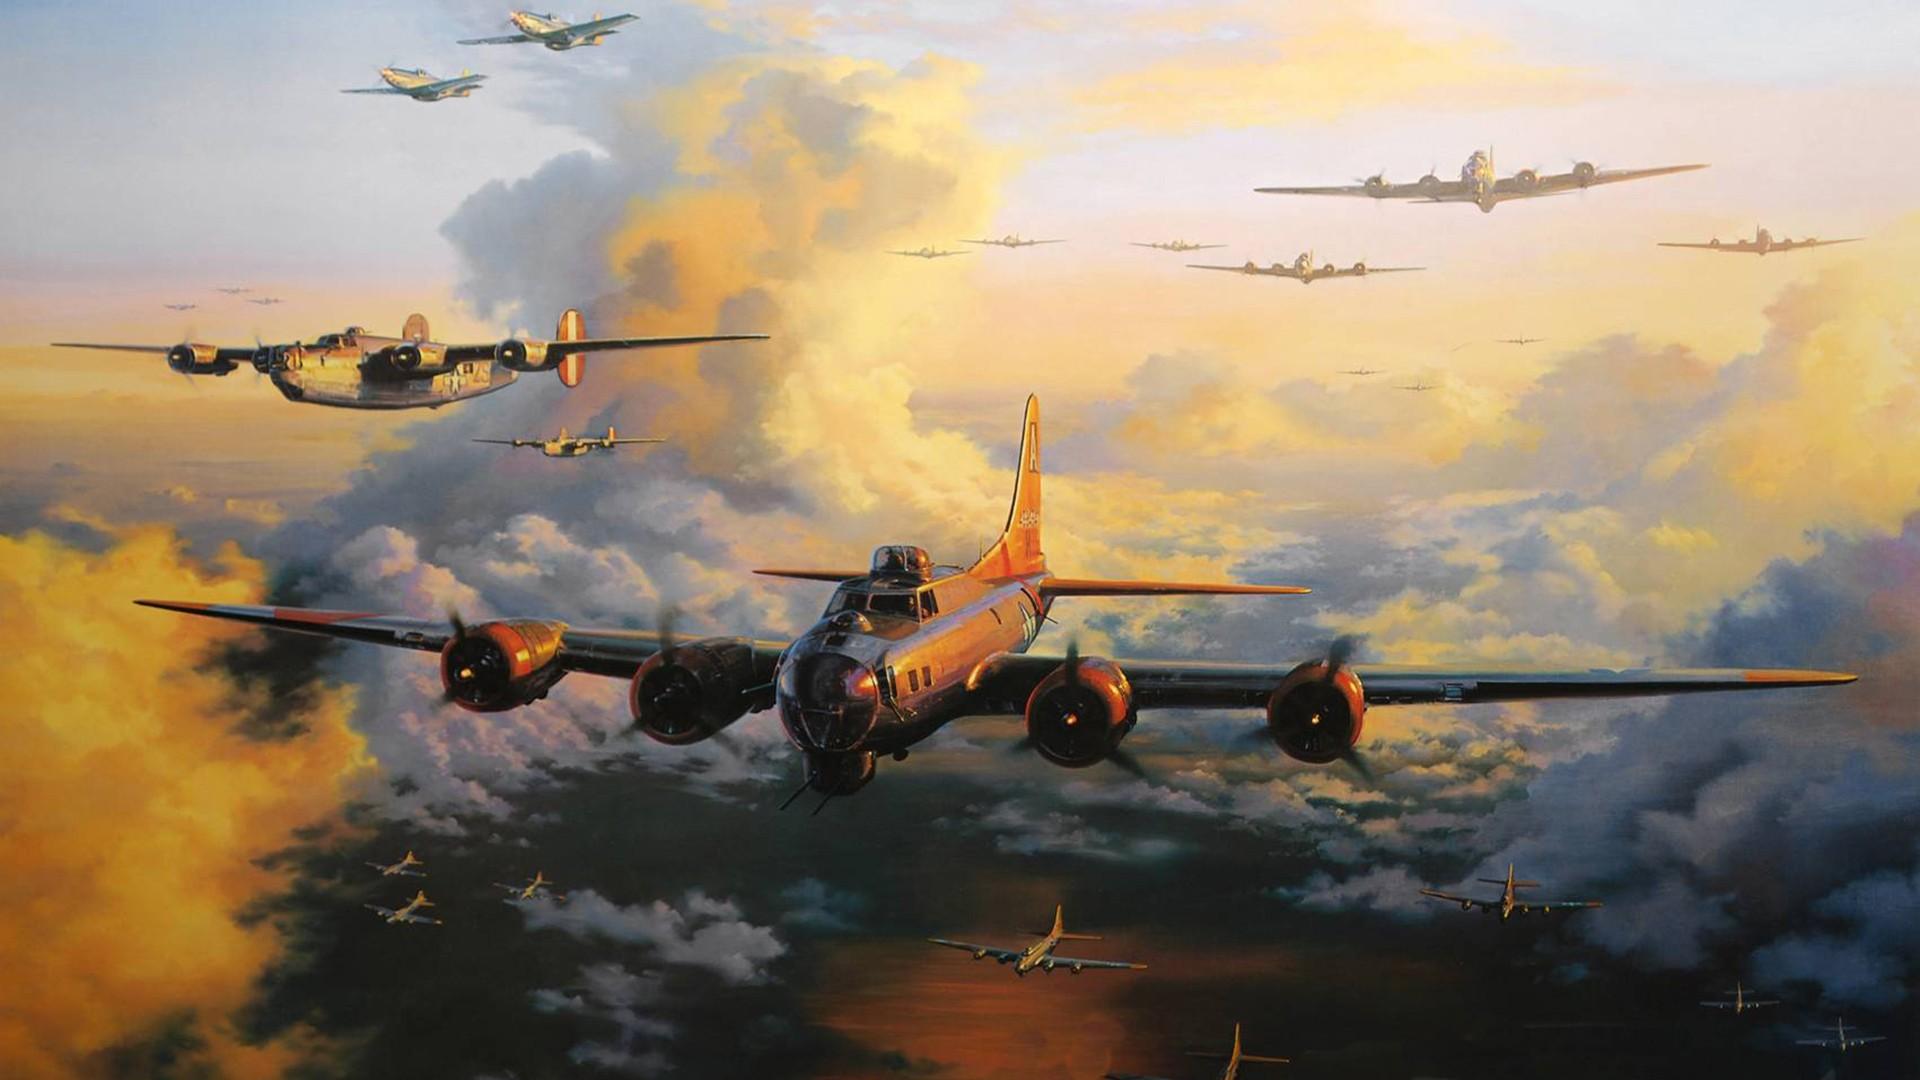 B 17 Flying Fortress Wallpaper 1920x1080